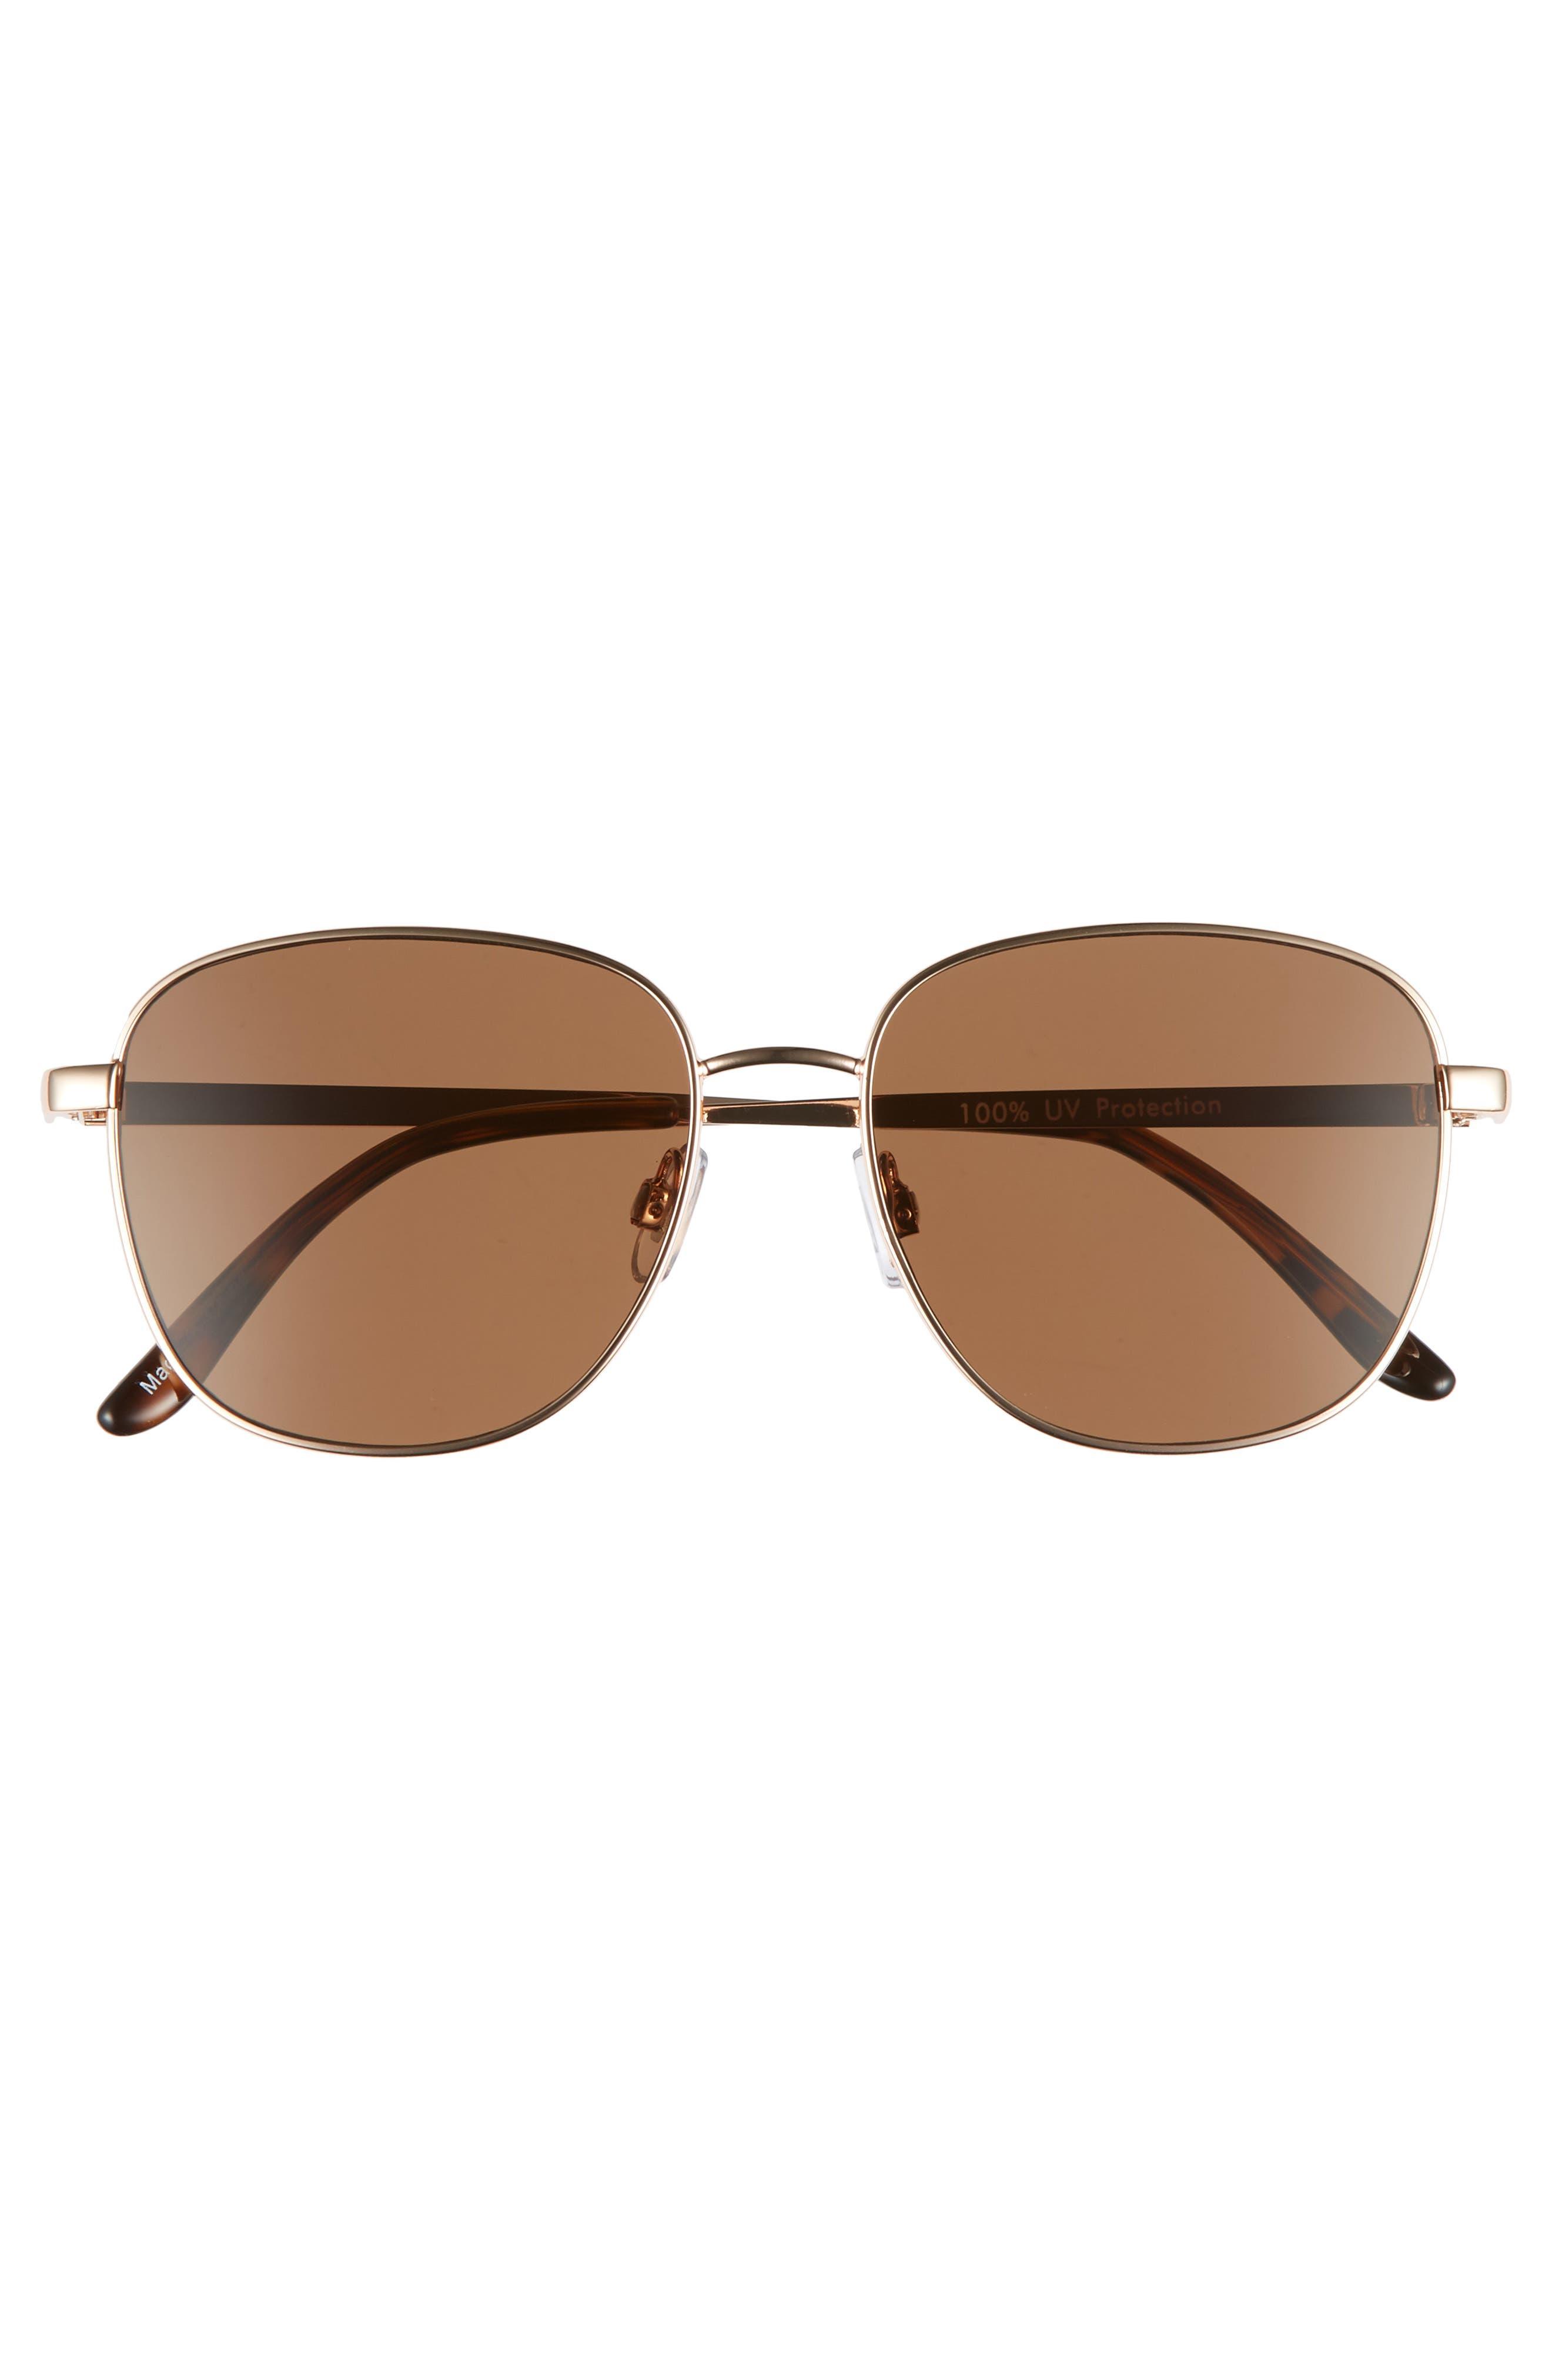 53mm Square Sunglasses,                             Alternate thumbnail 3, color,                             710